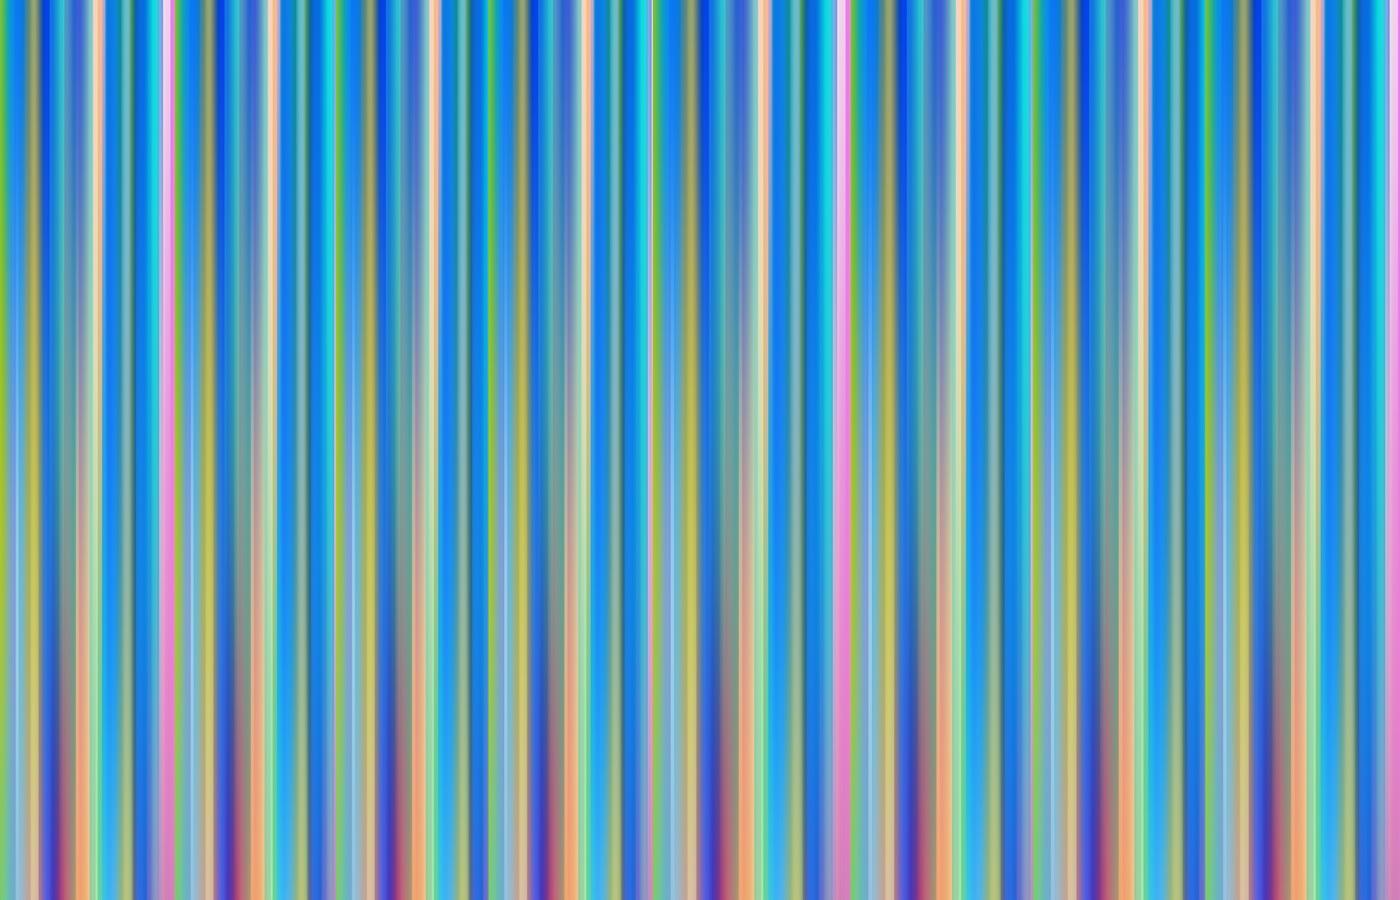 colorful-aesthetics-pattern-background-zo.jpg